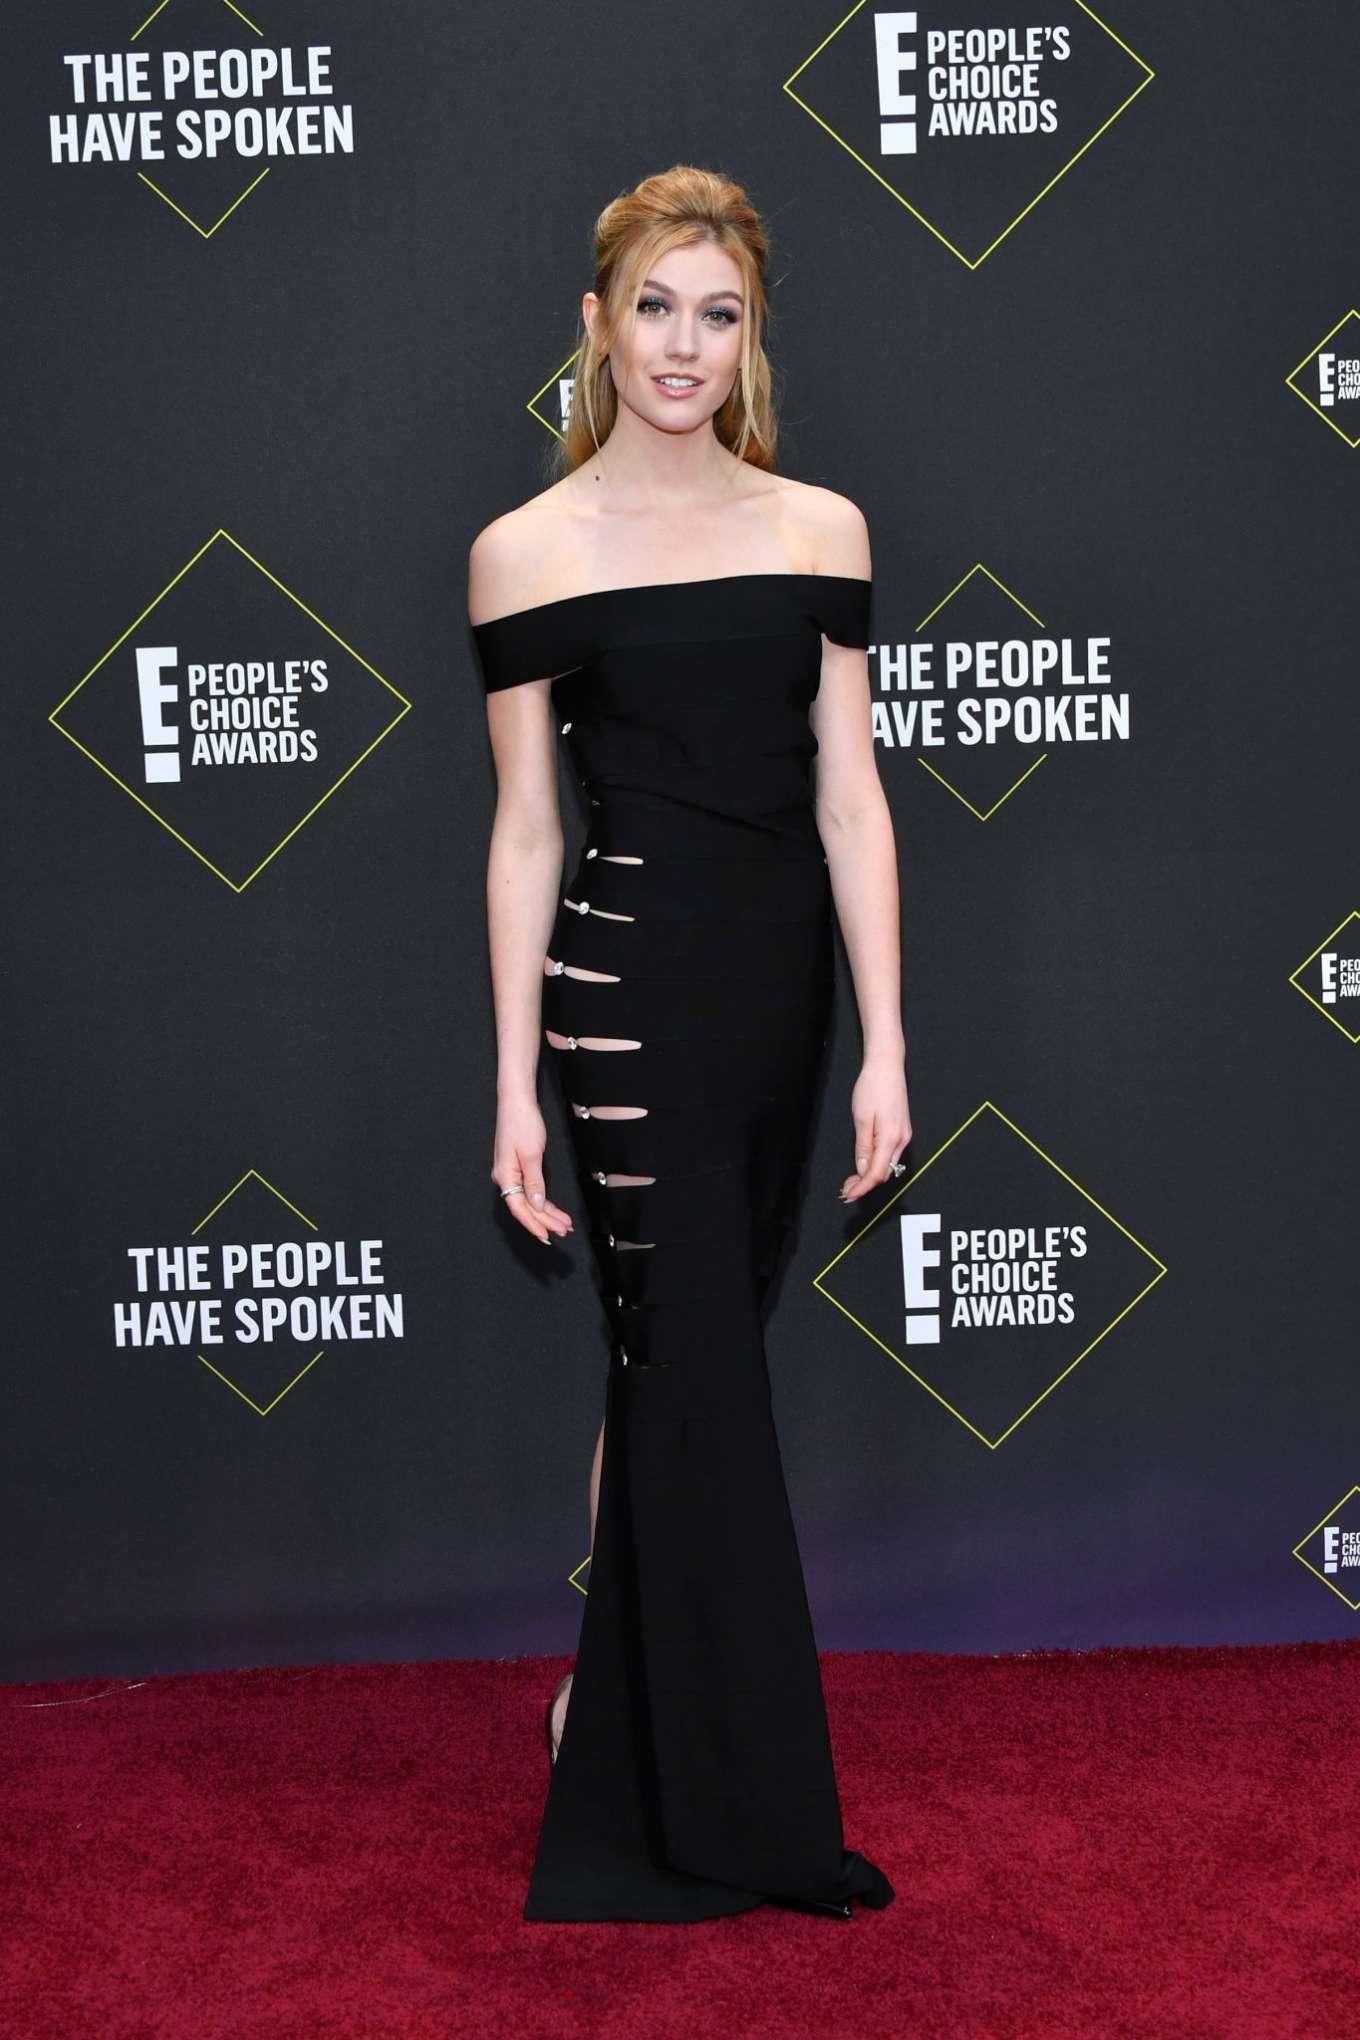 Katherine McNamara - 2019 E! People's Choice Awards in Santa Monica